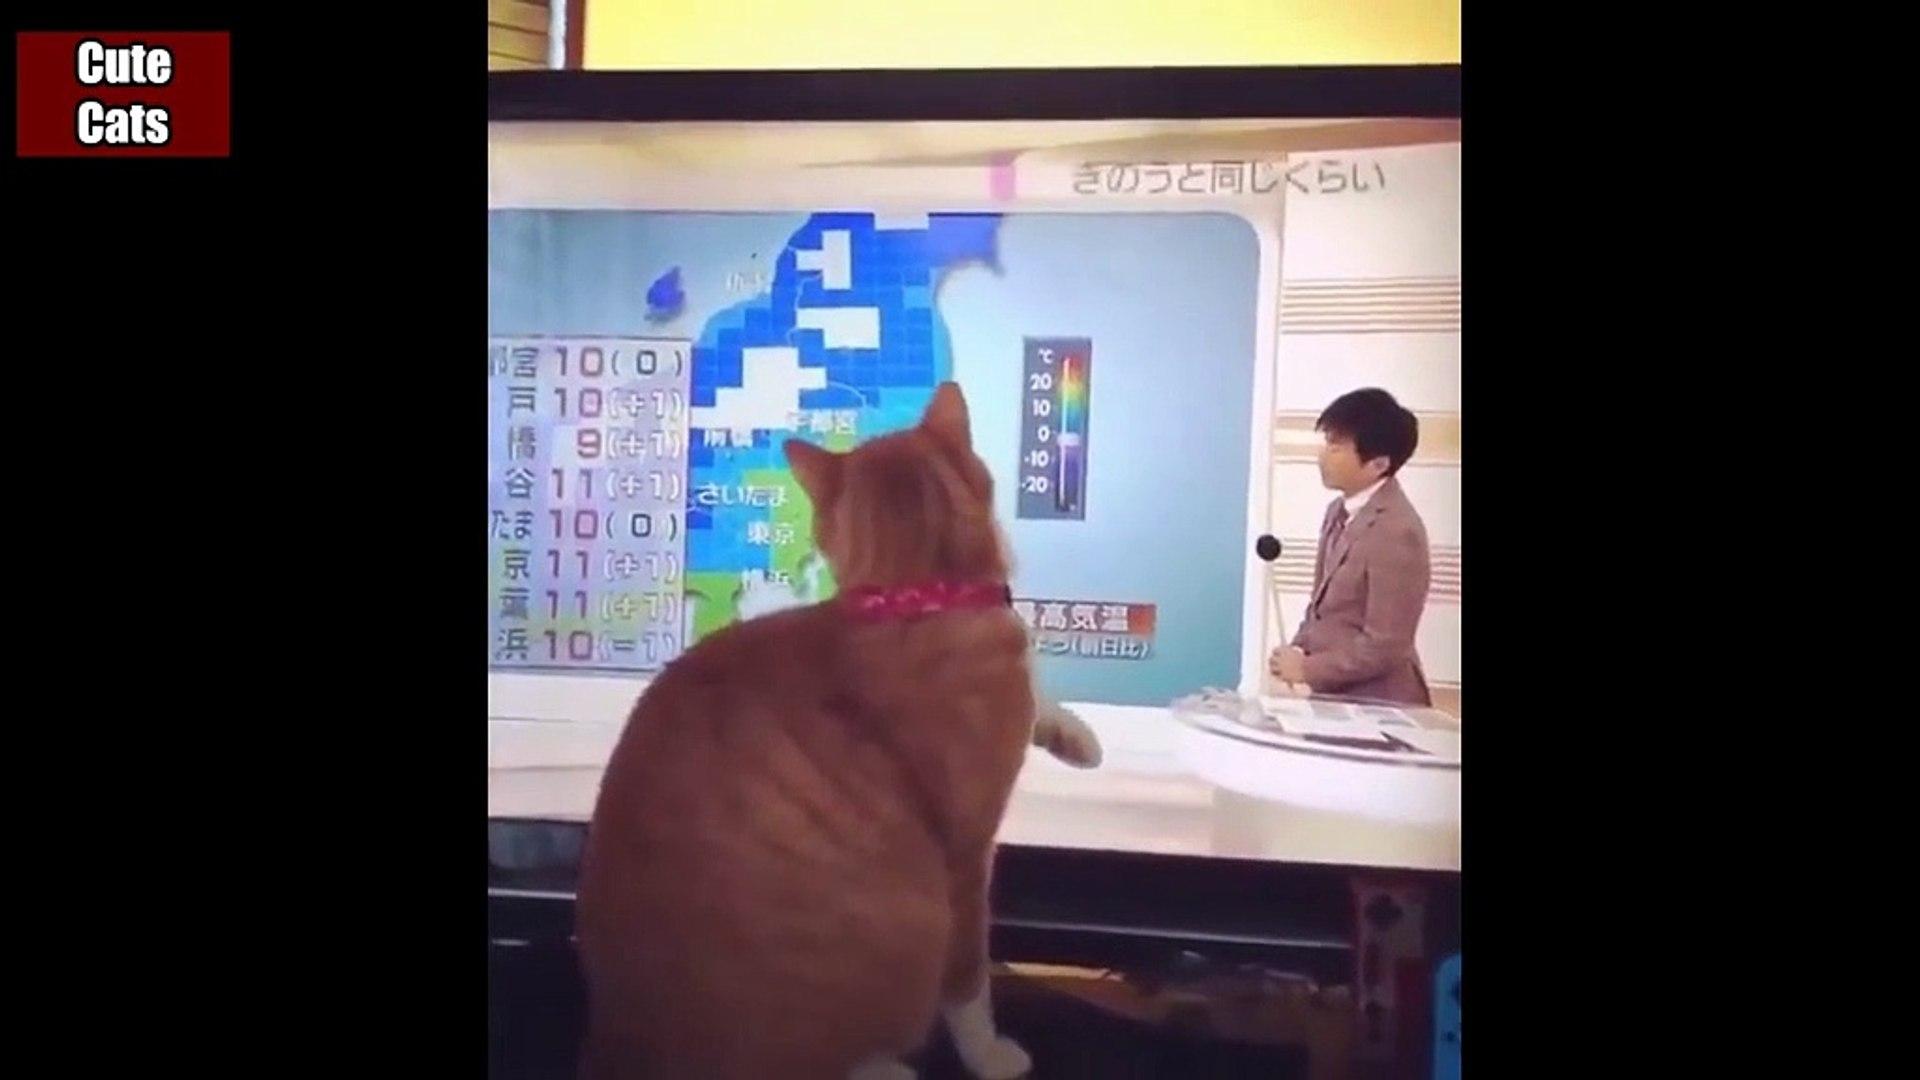 Cats cats Funny Videos #8 - Funny Animals - Cute cats - Funny cats